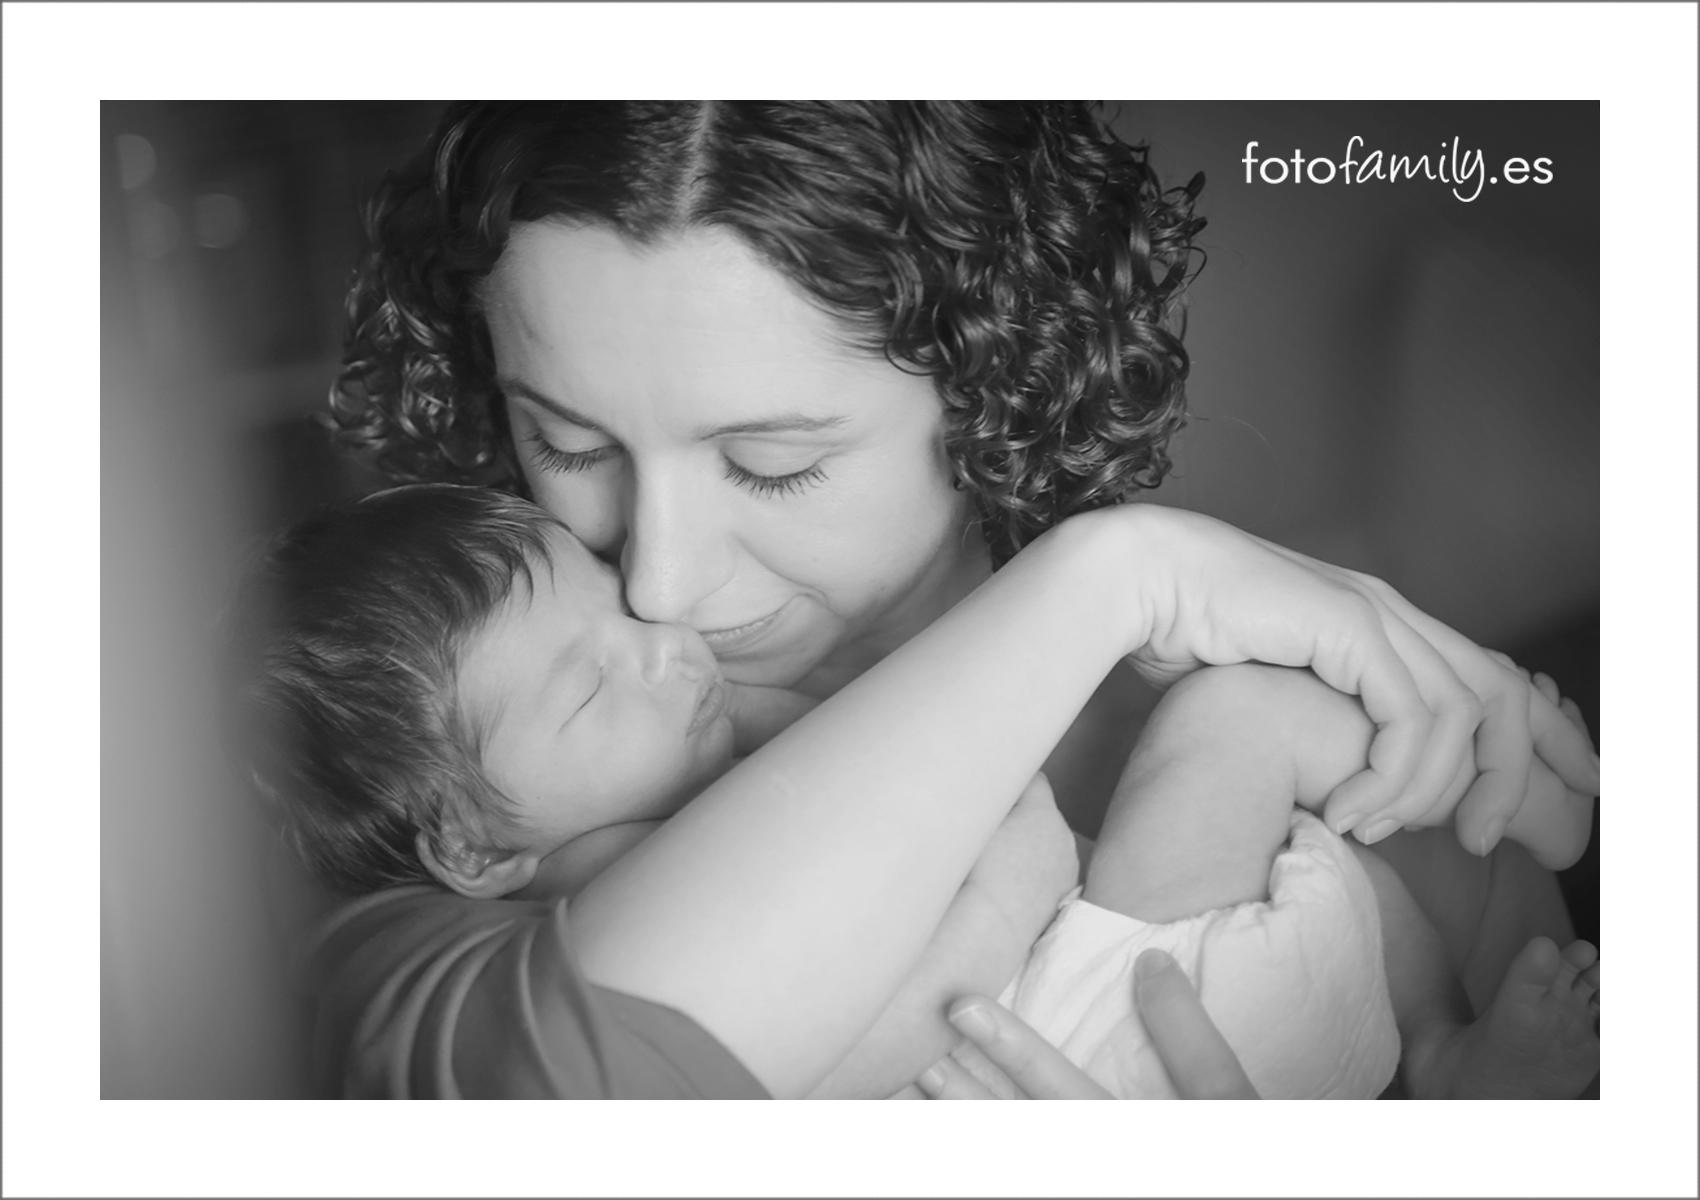 book recien nacido fotofamily